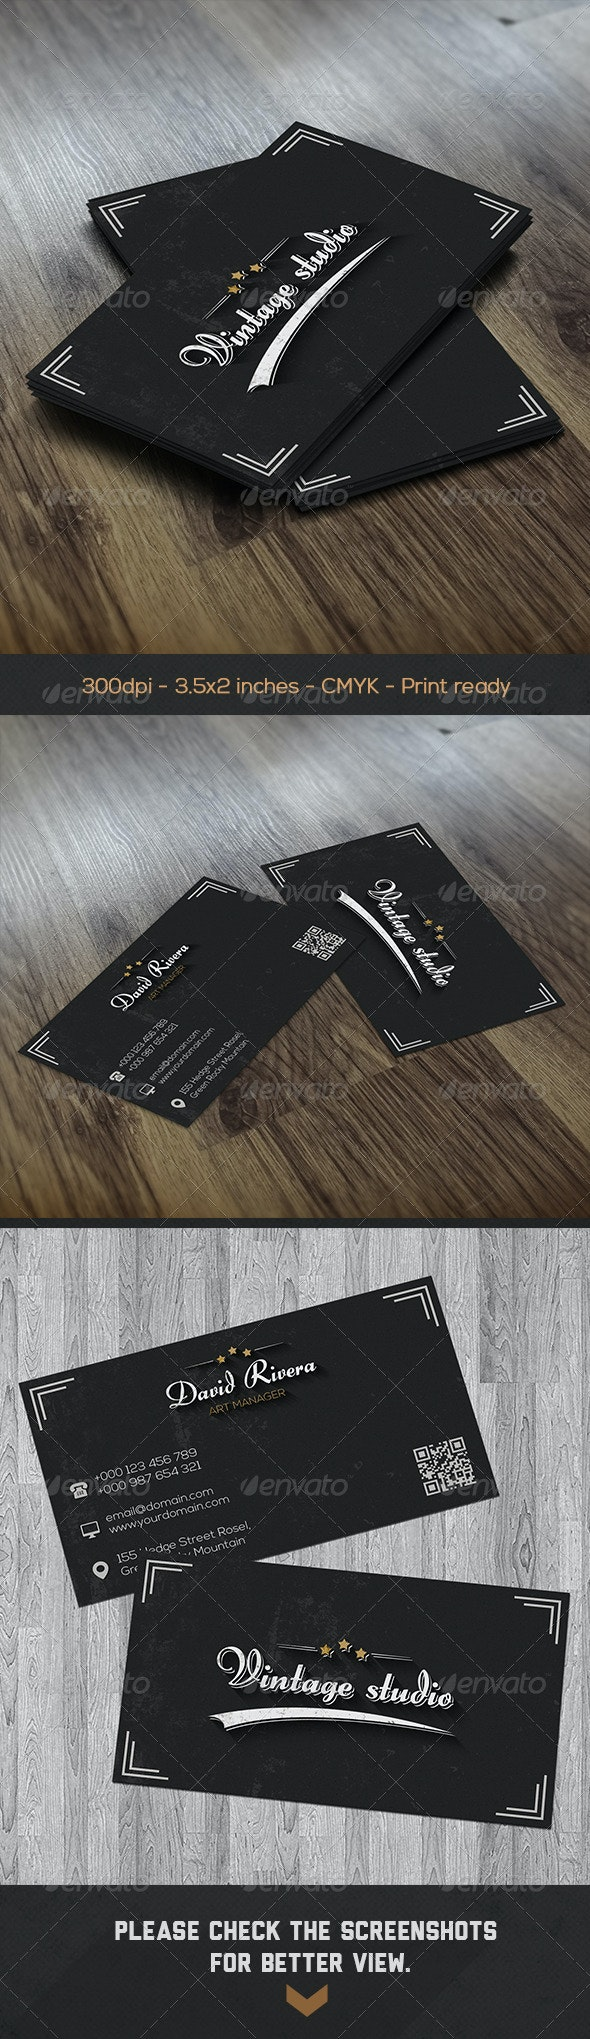 Black Vintage Creative Studio Business Card - Business Cards Print Templates